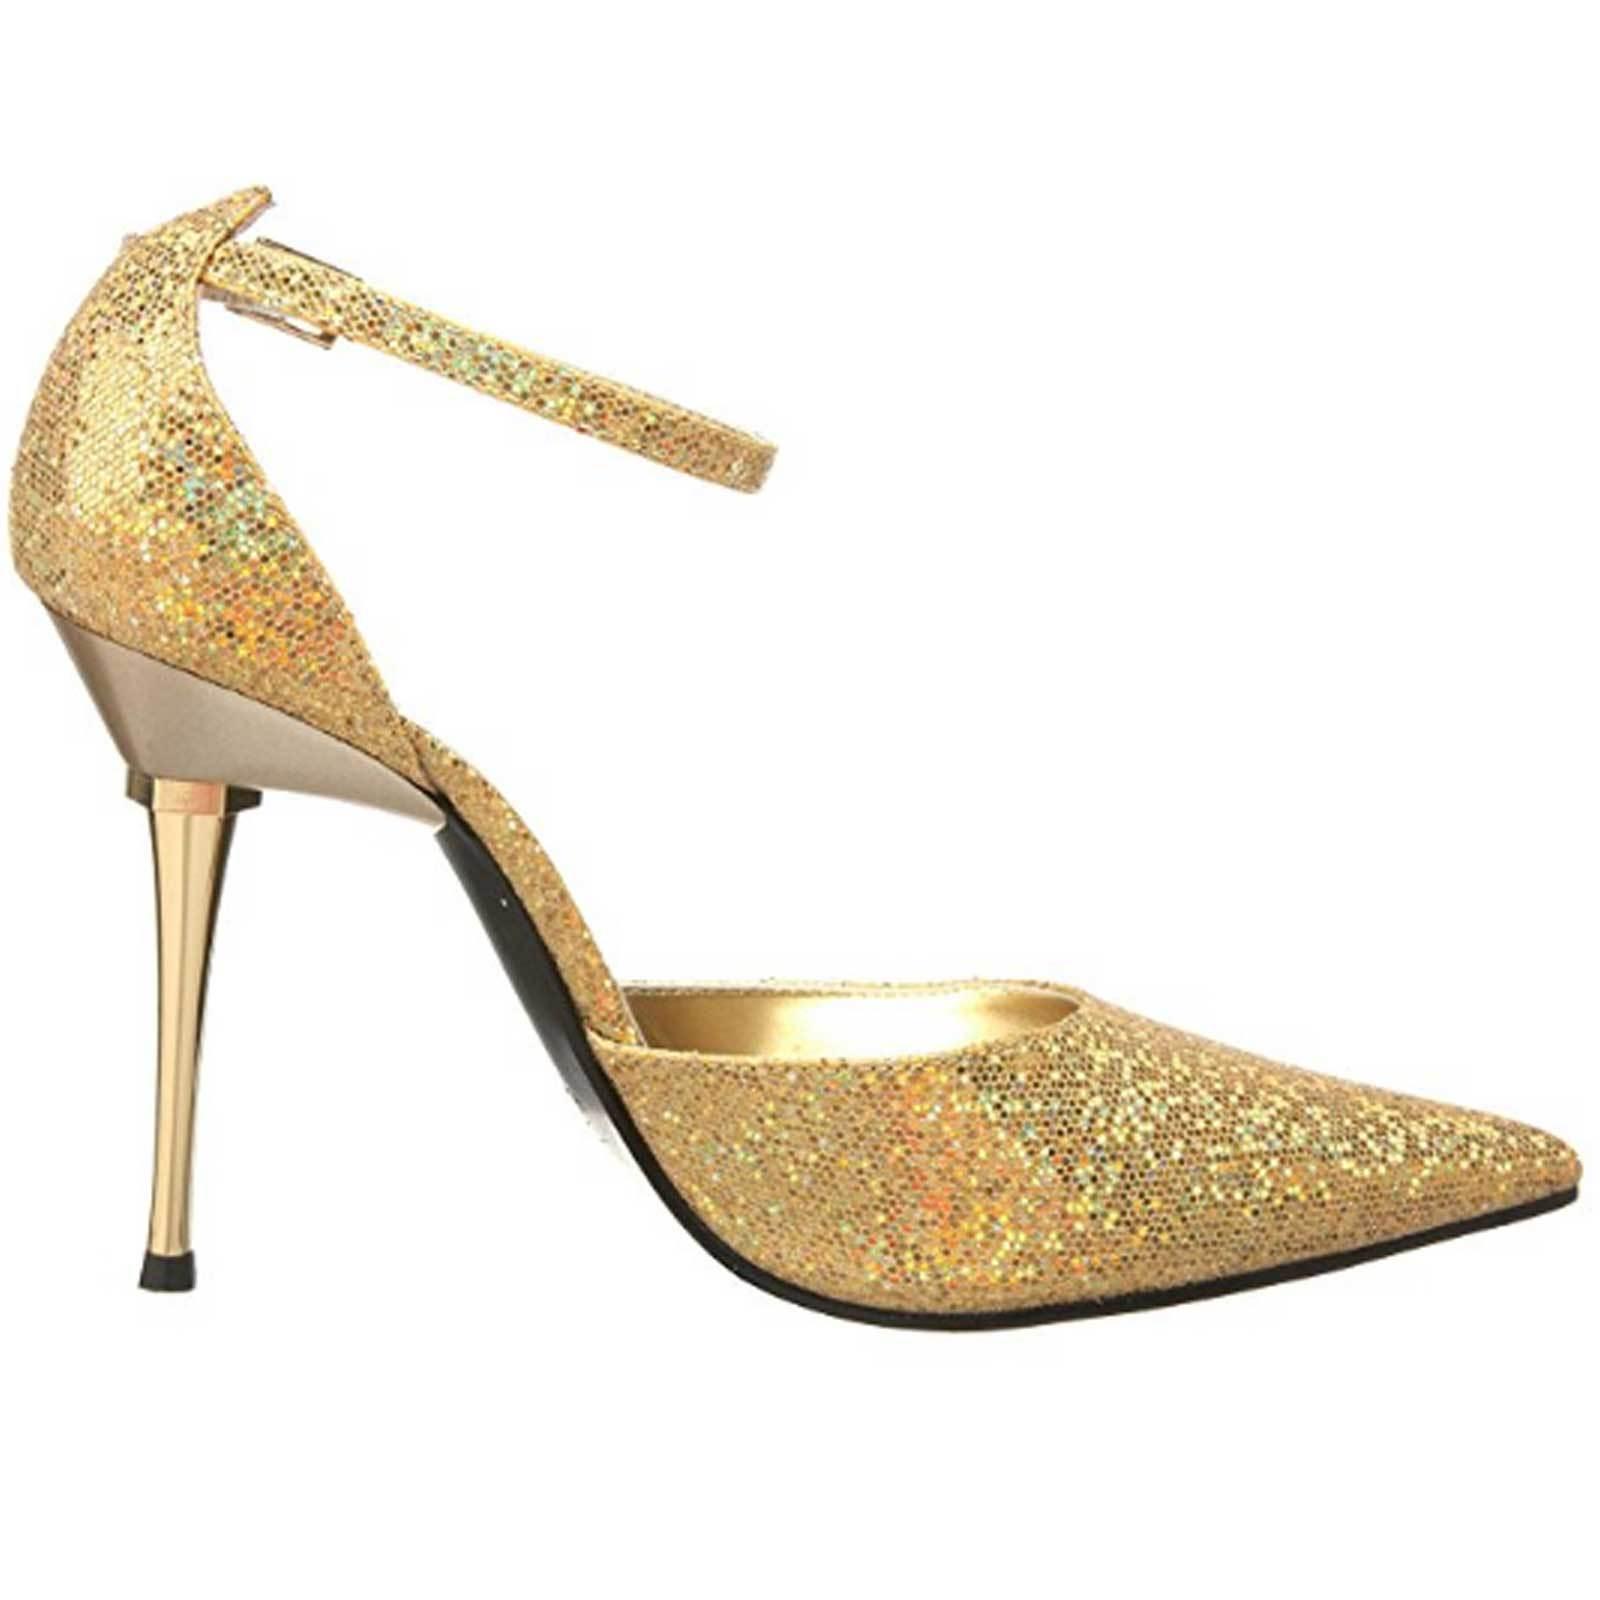 Highest Heel Stiletto D'Orsay Pointy Toe Pump Ankle Strap SLICK-101 Gold Glitter